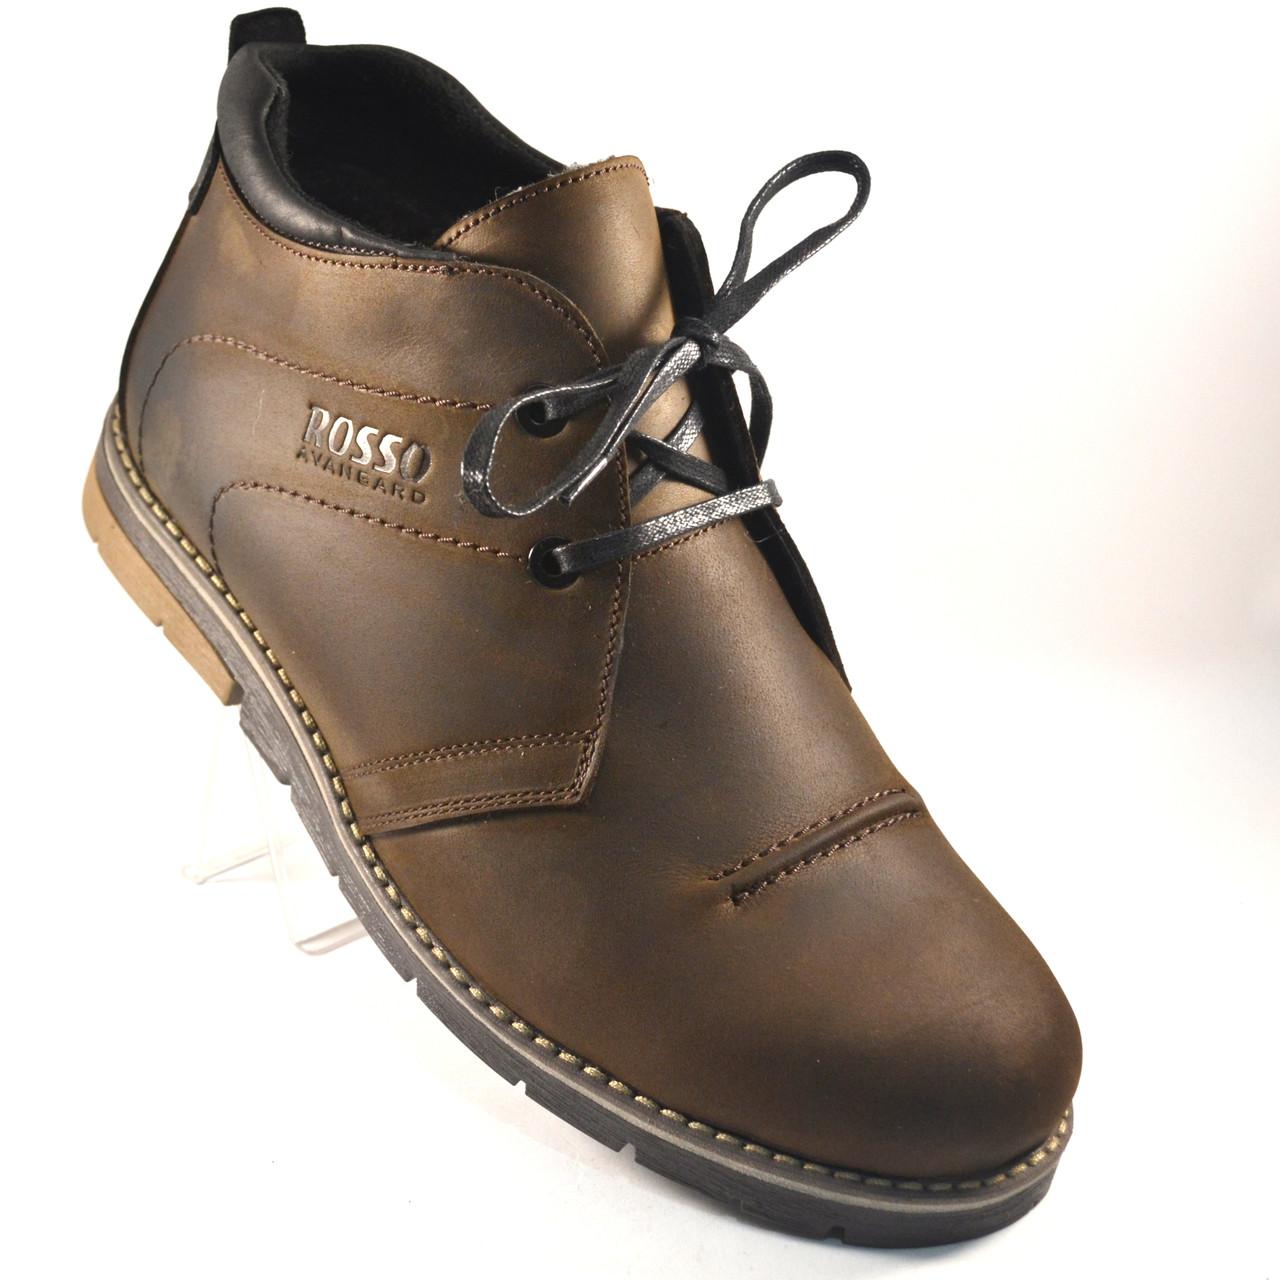 d0c097780b85 Коричневые зимние мужские ботинки дезерты кожаные Rosso Avangard.  WinterkingZ Mocha Brown Street -